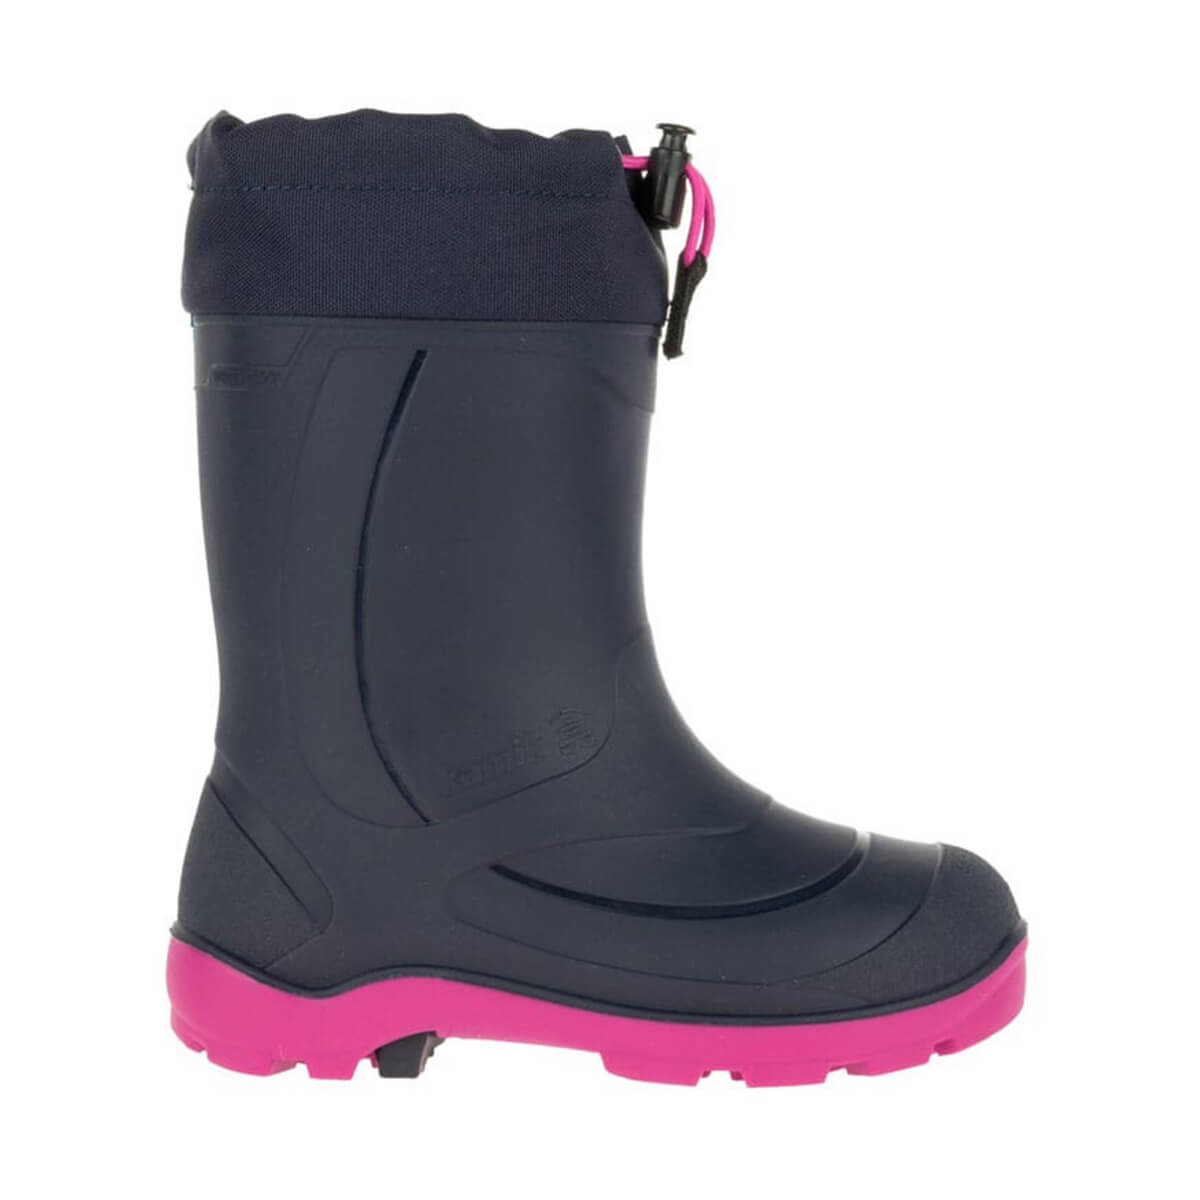 Kids Snowbuster 1 Winter Boot - Navy/Magenta